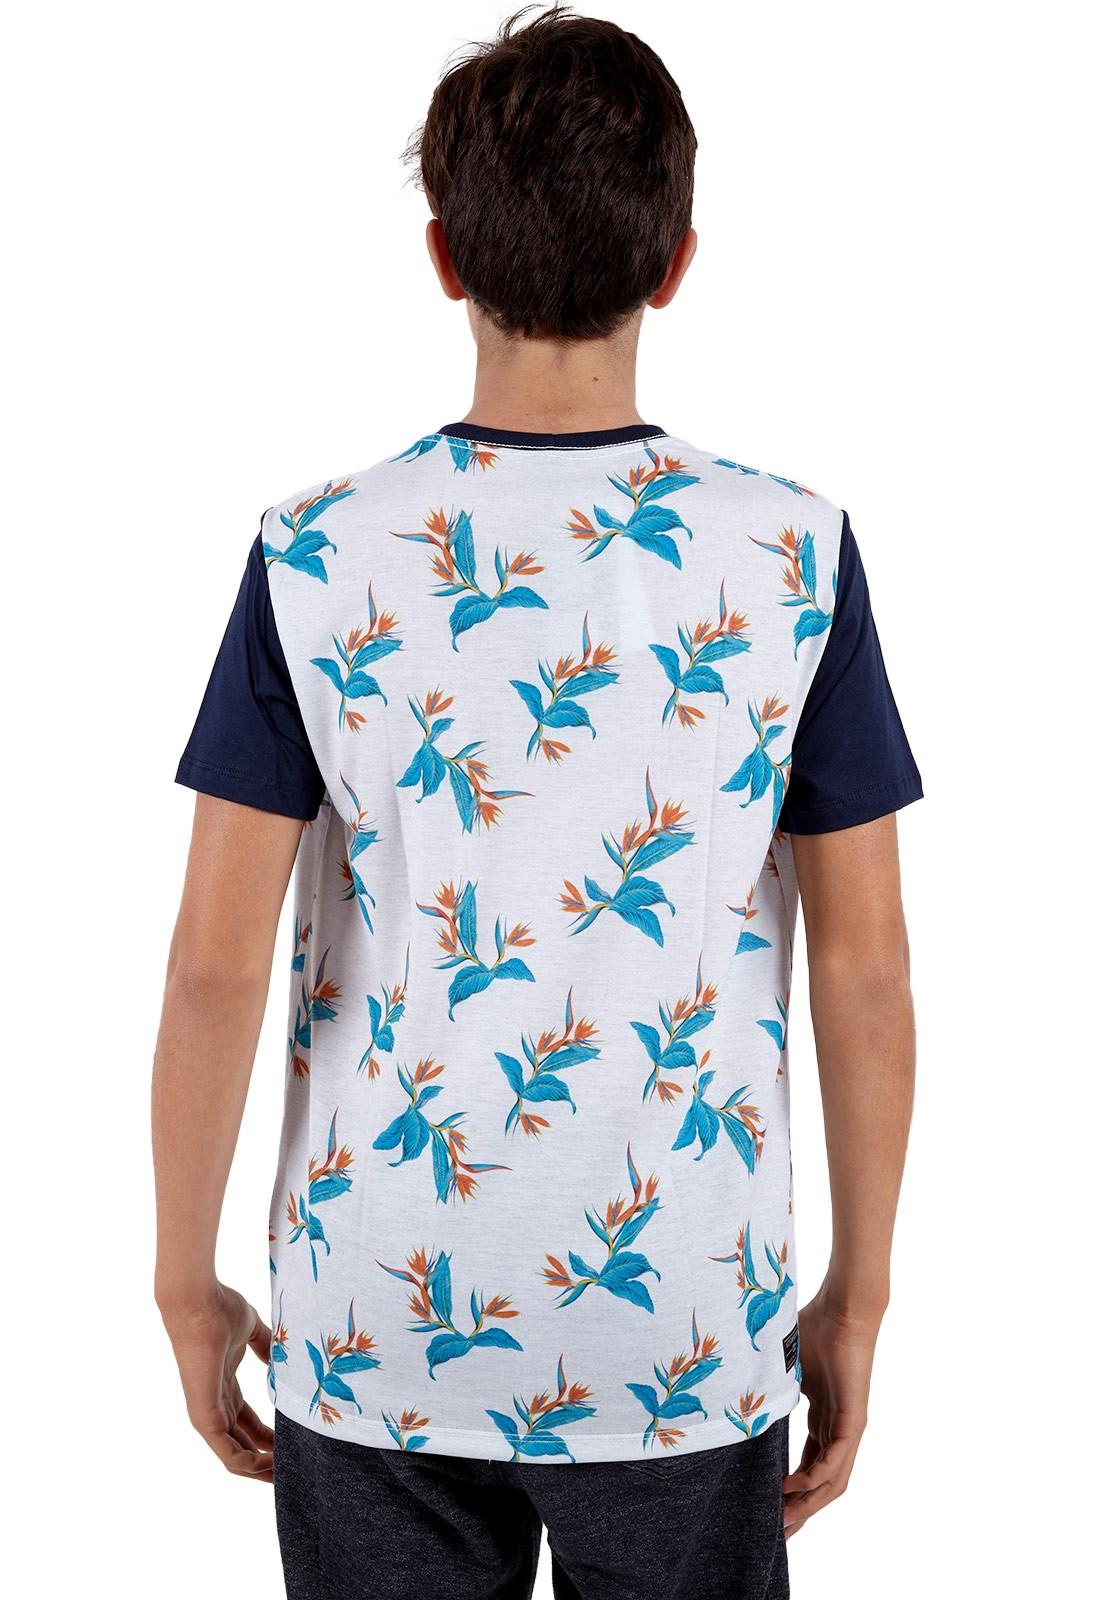 Camiseta Vida Marinha Manga Curta Branco/Azul